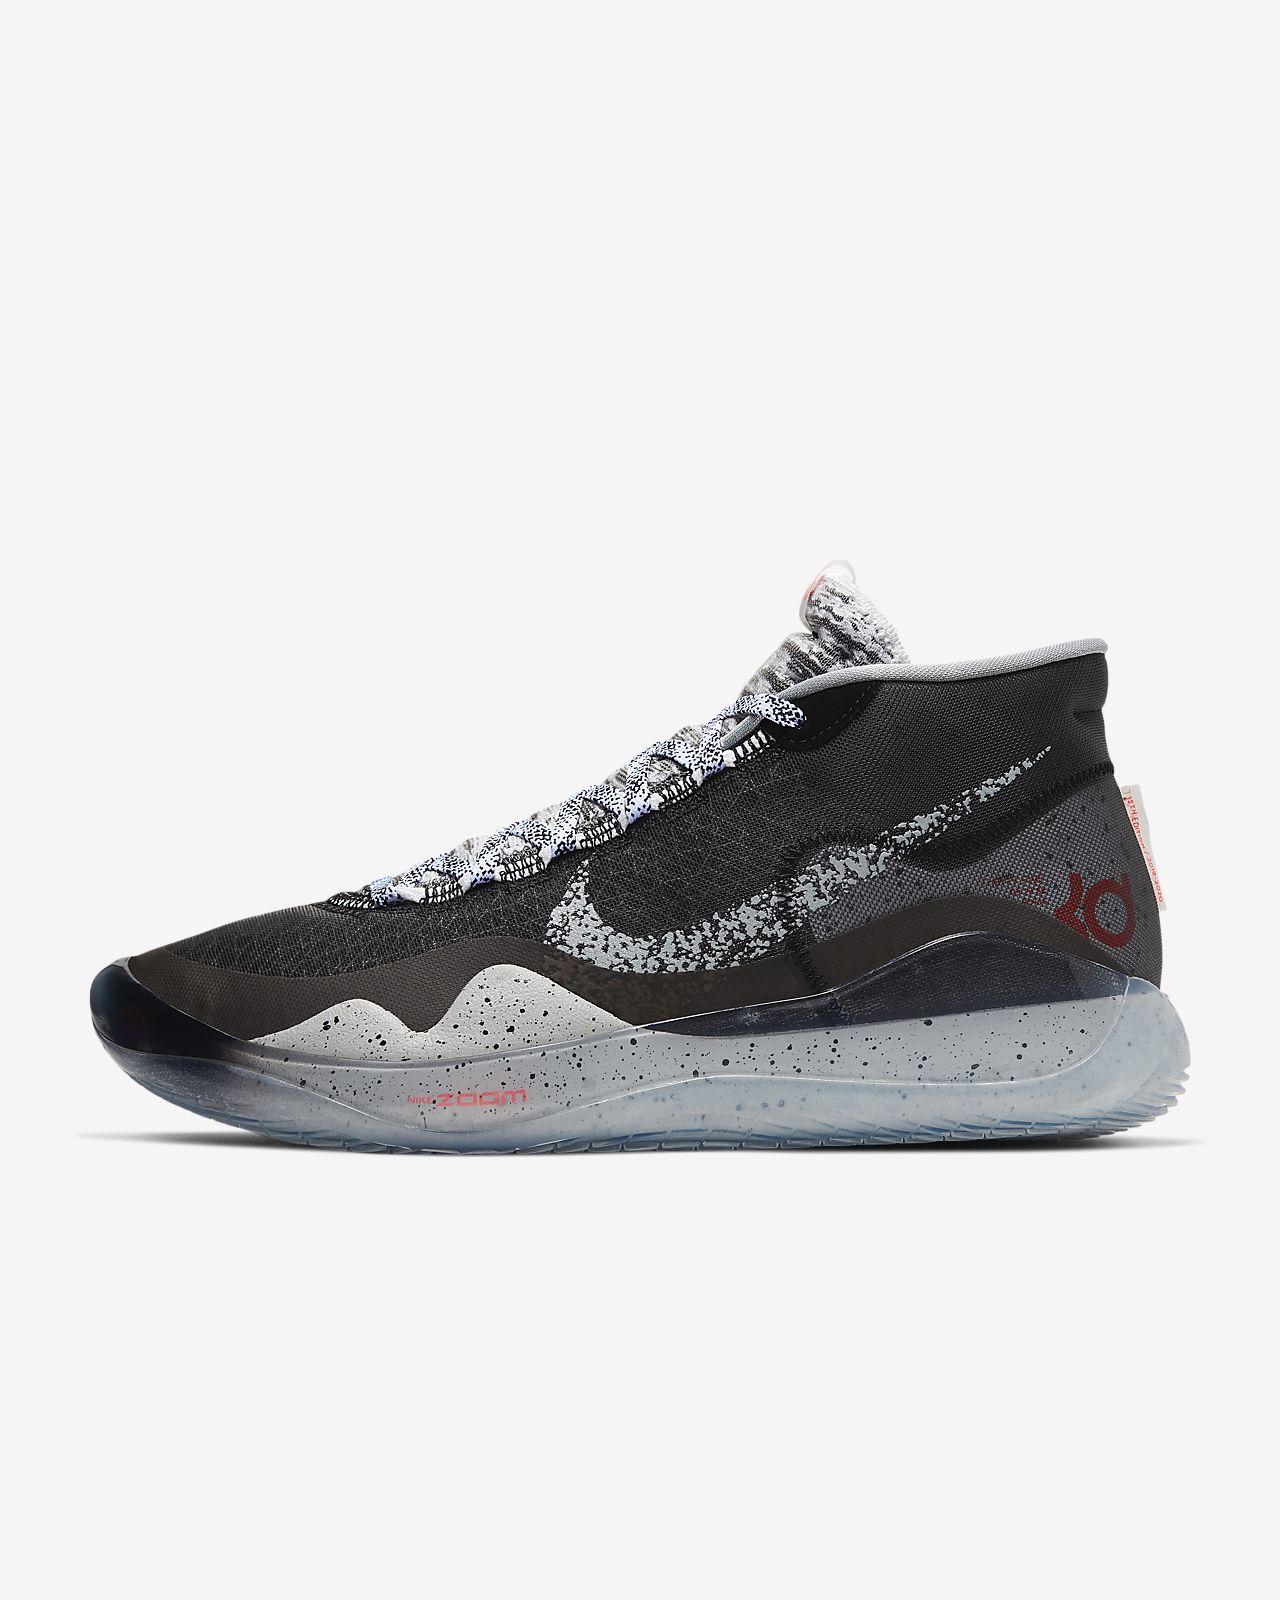 7 Best Nike kd images Nike basketballsko, Nike tennis  Nike basketball shoes, Nike tennis